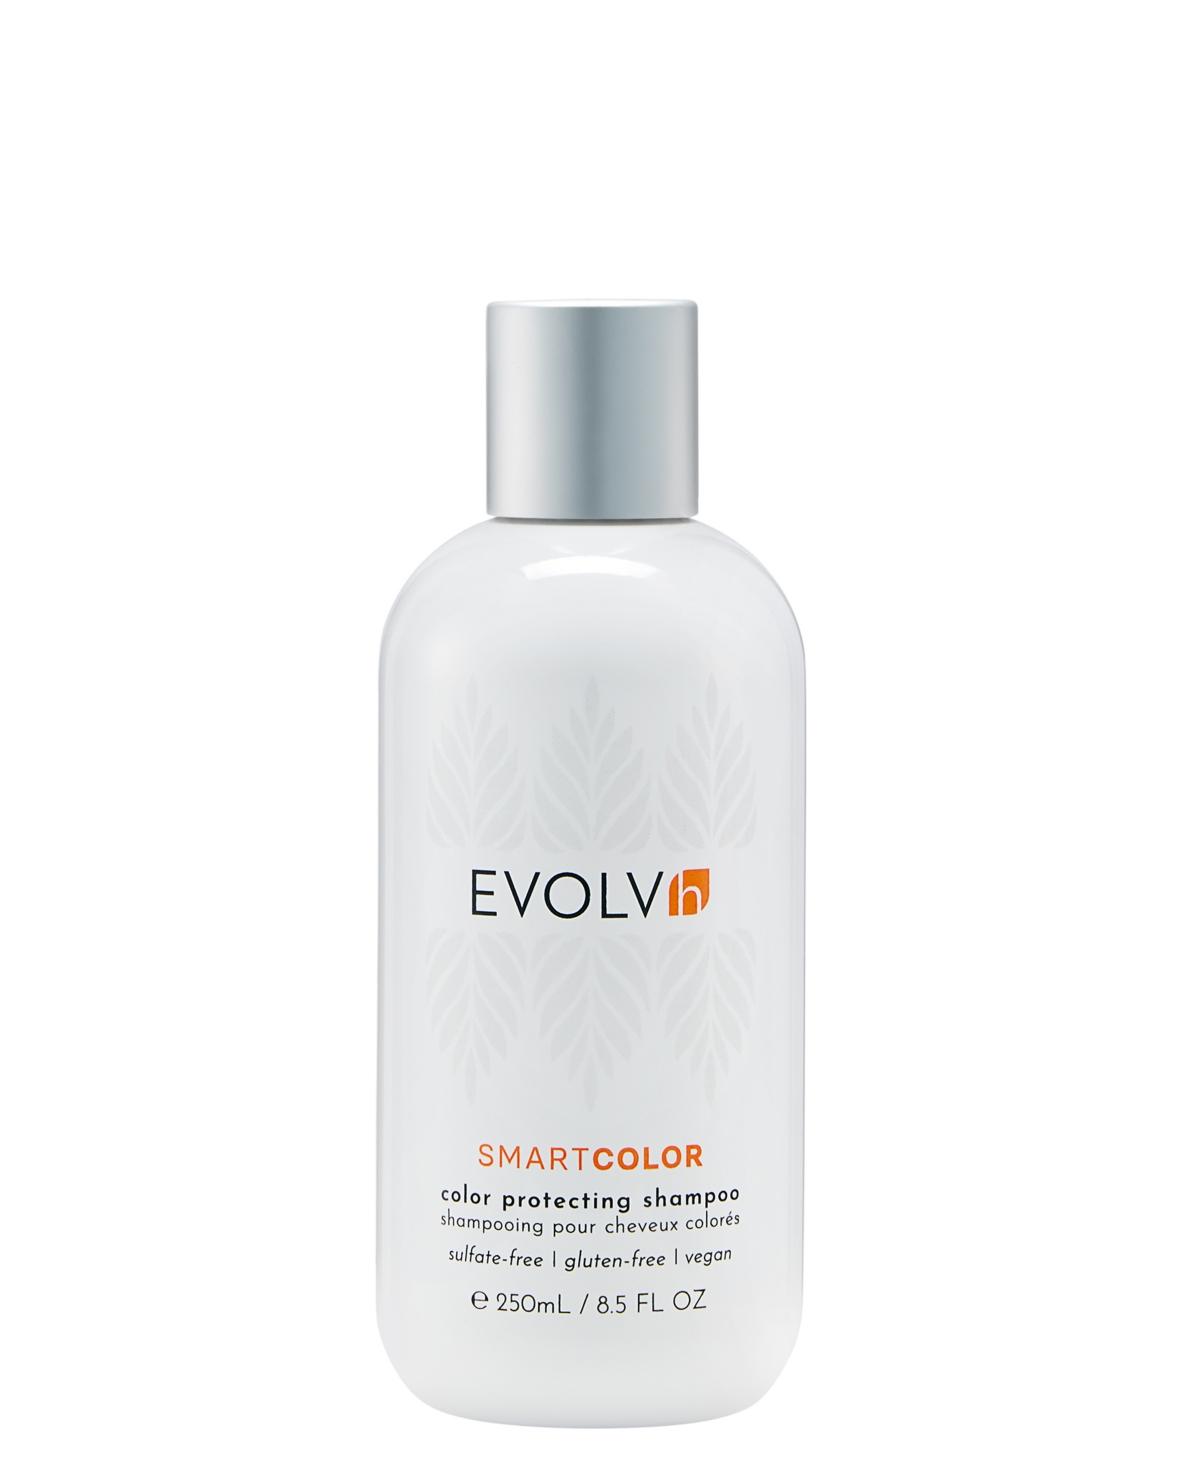 EVOLVh SmartColor Protecting Shampoo, 8.5 Oz